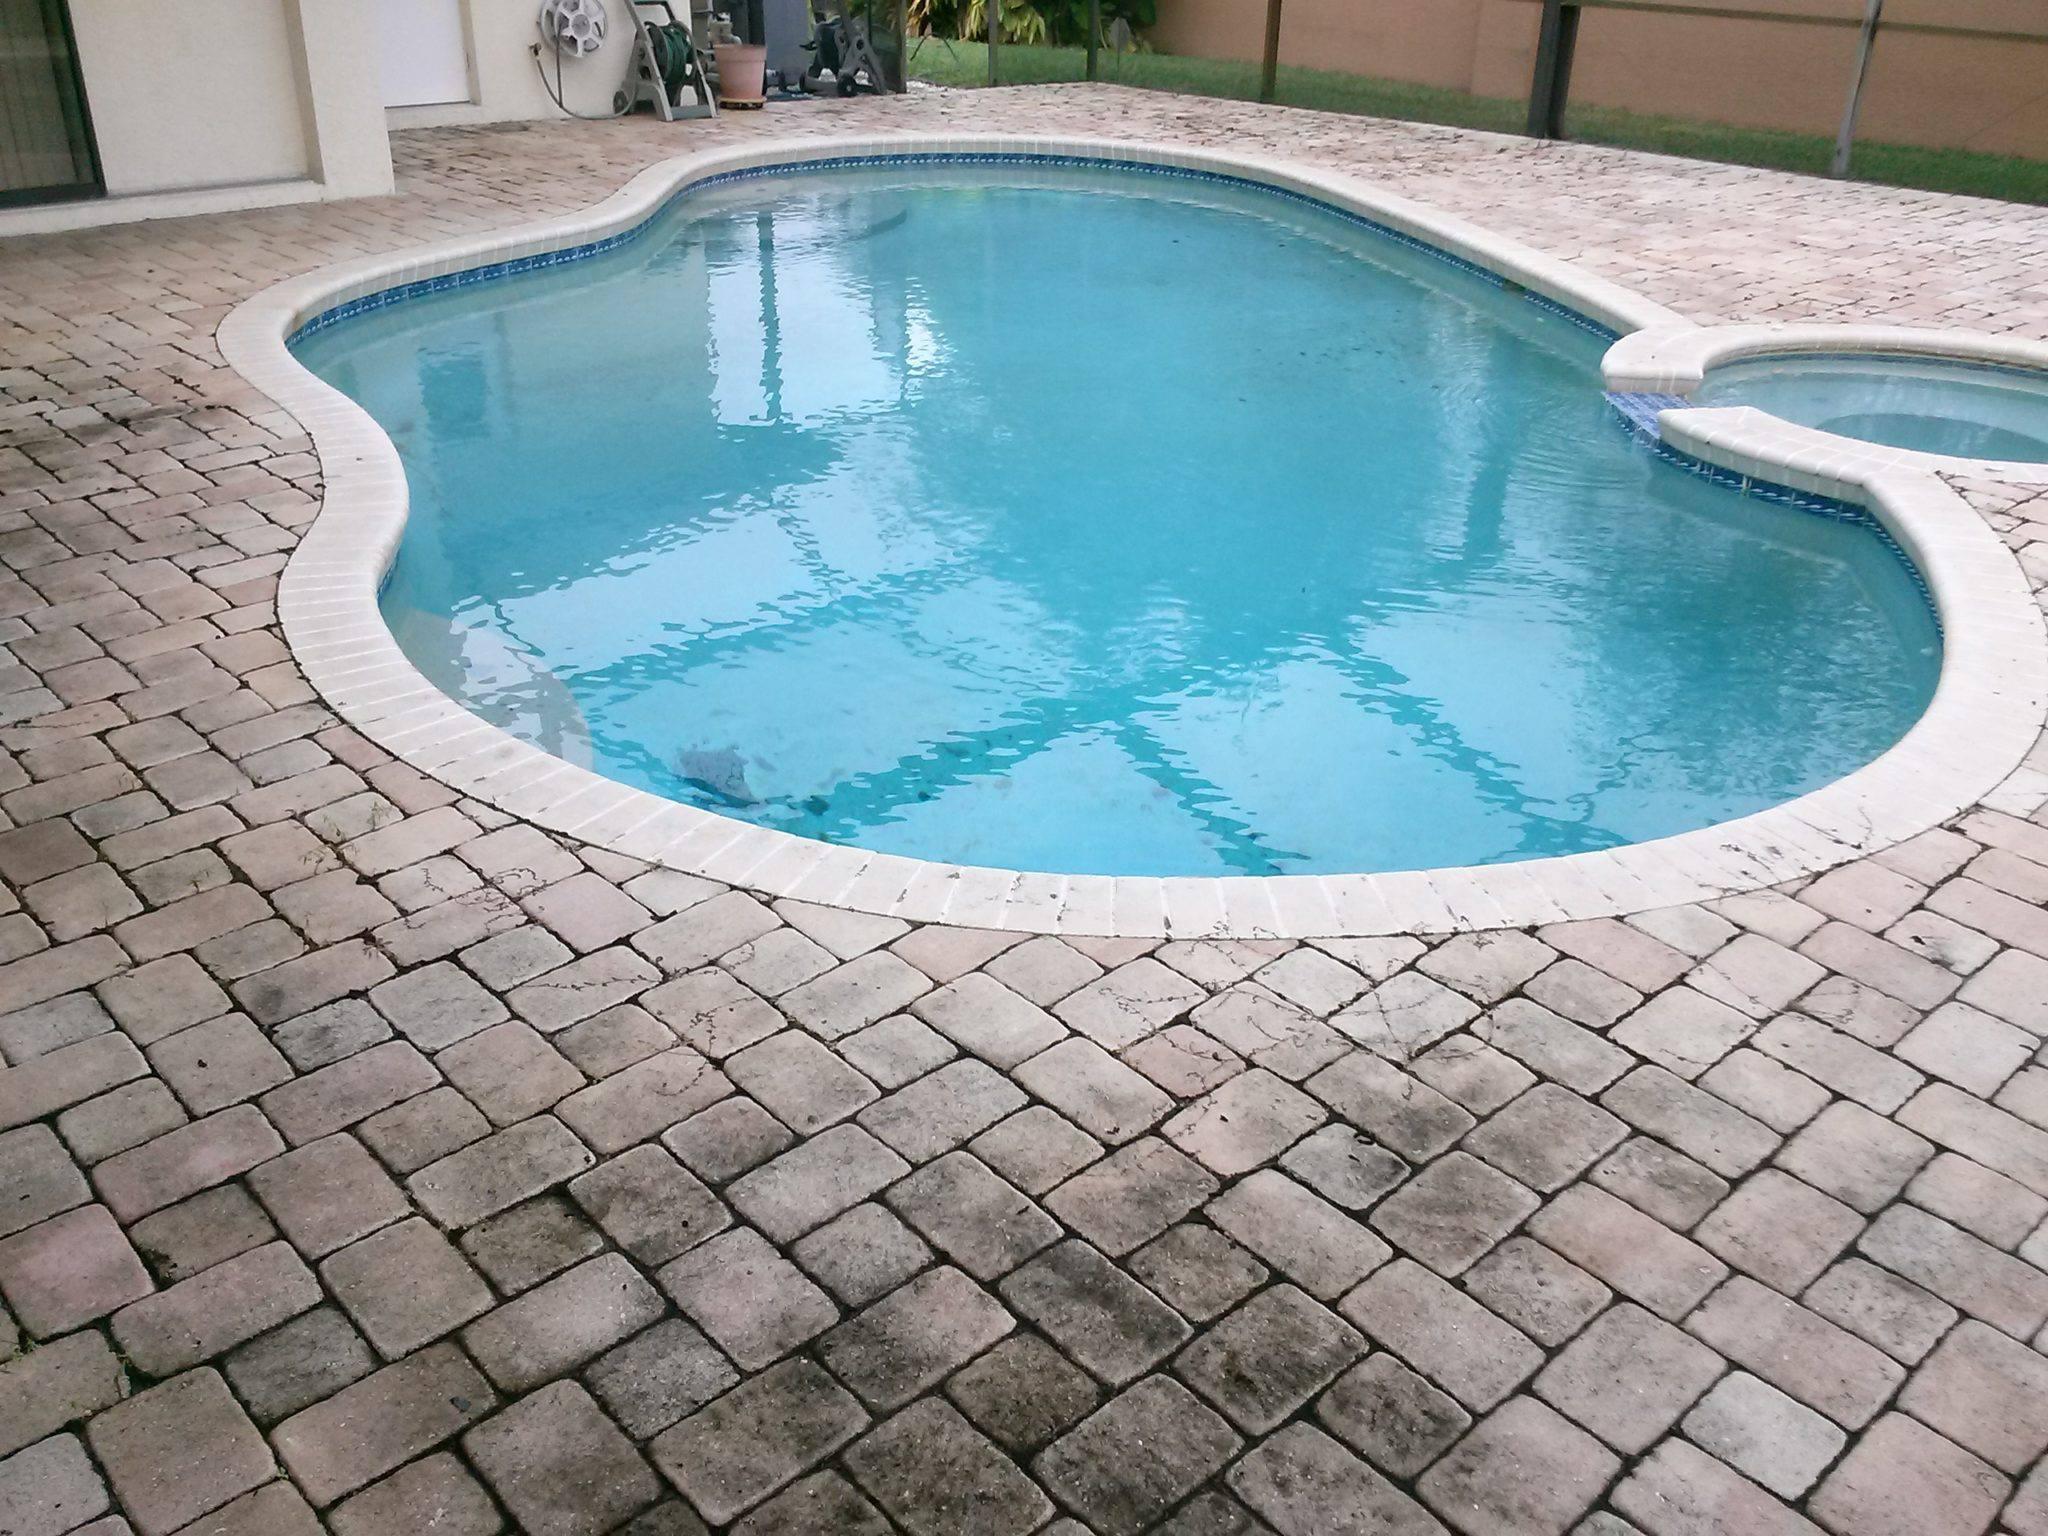 Pressure washing services oldsmar florida for Pressure clean pools